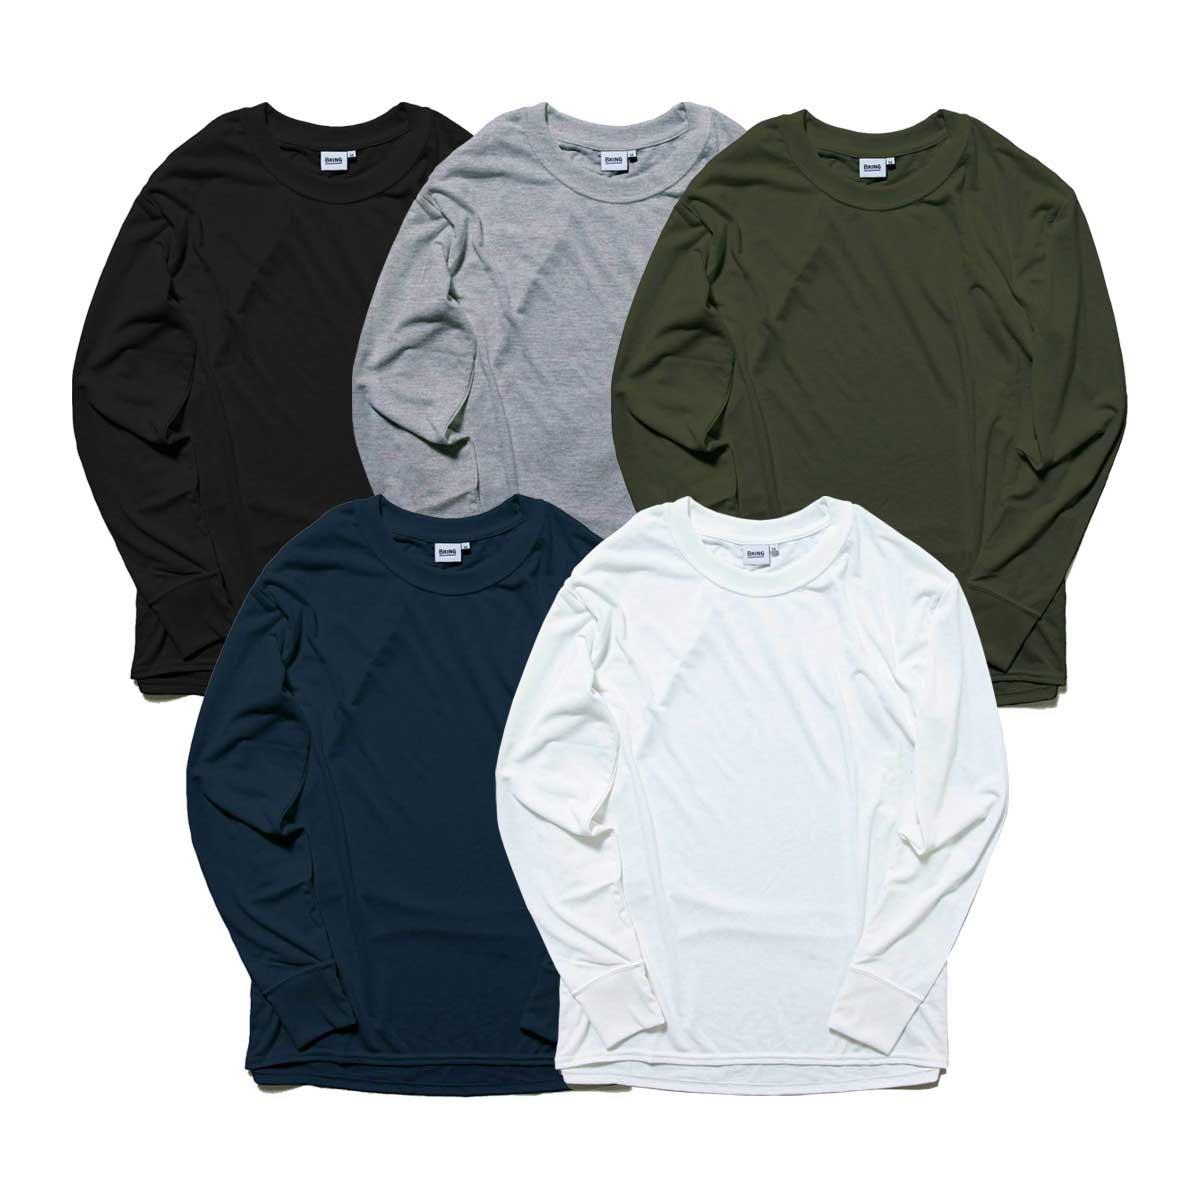 BRING DRY LOG SLEEVE T-SHIRT ロングスリーブ Tシャツ